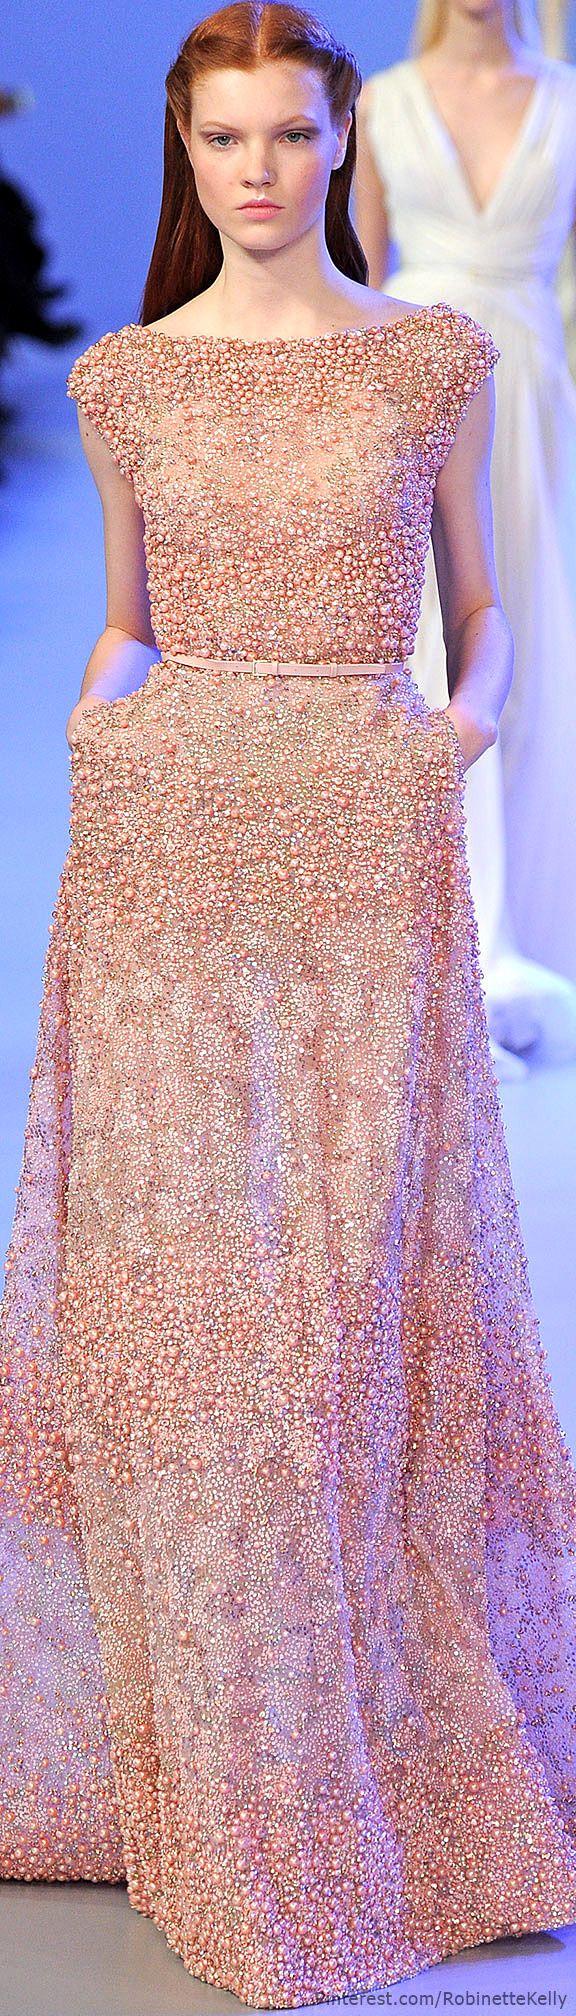 Elie Saab Haute Couture | S/S 2014 jaglady | Festaaaaa ...